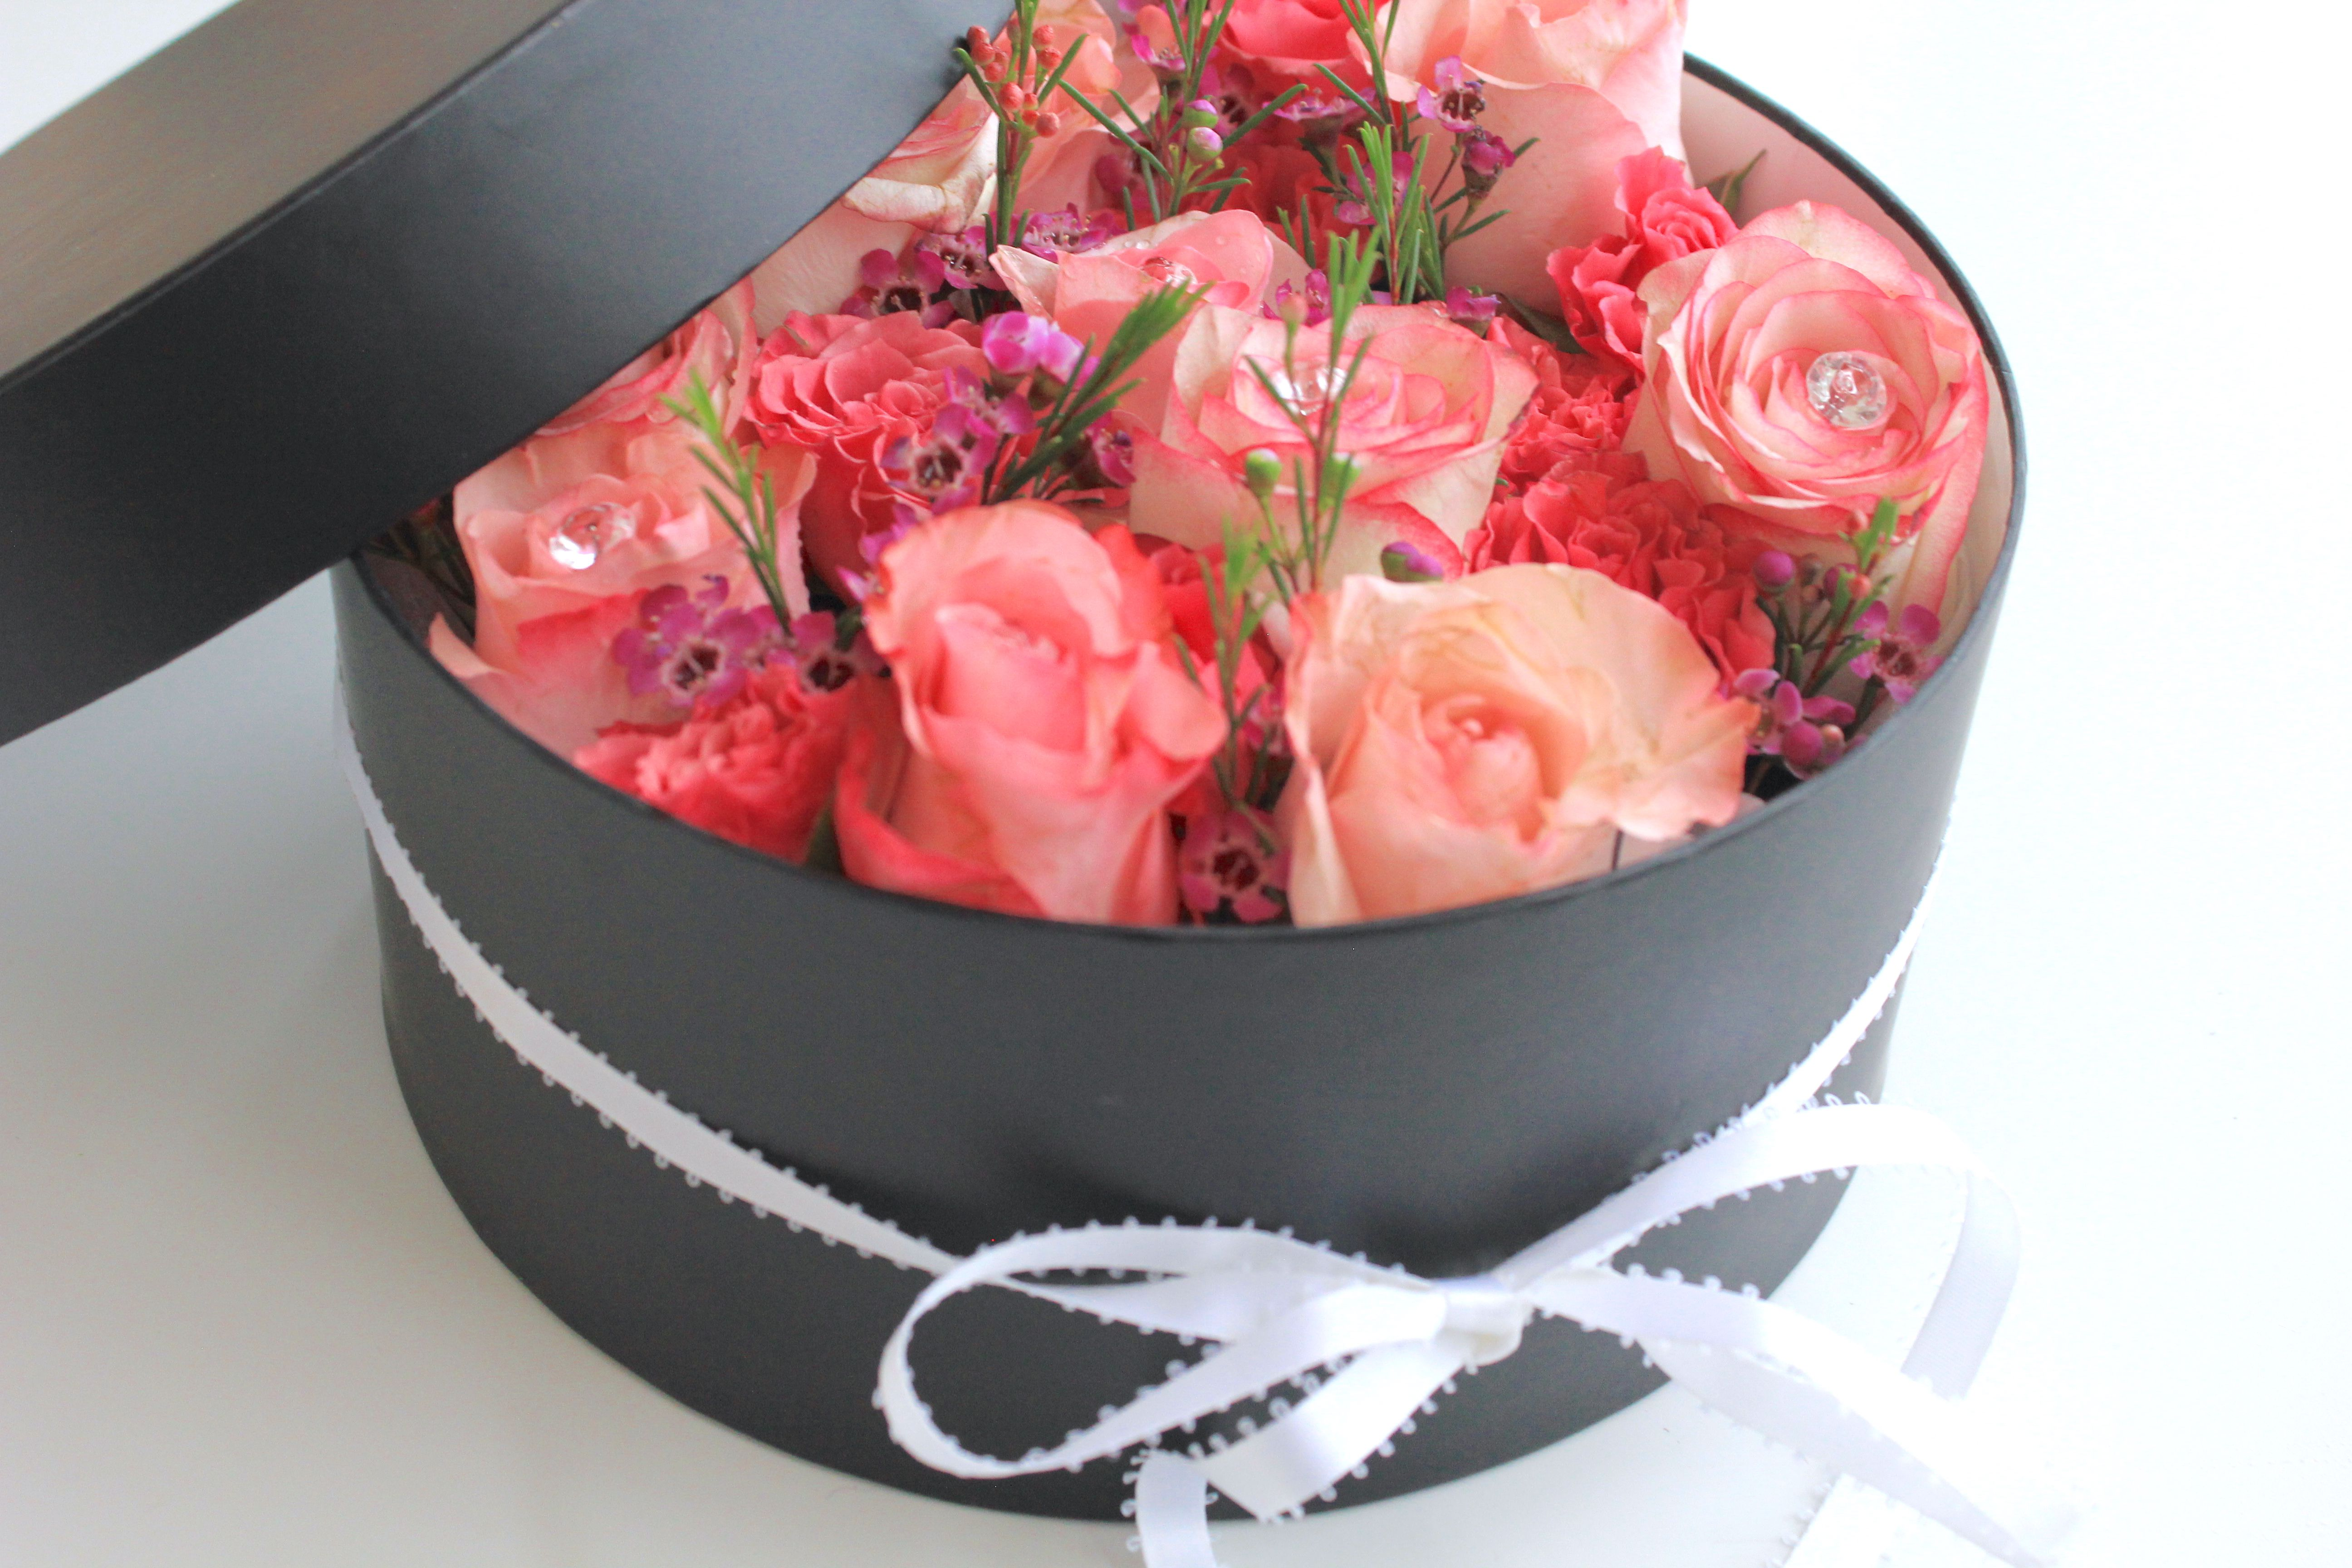 Blossoms for Days kit